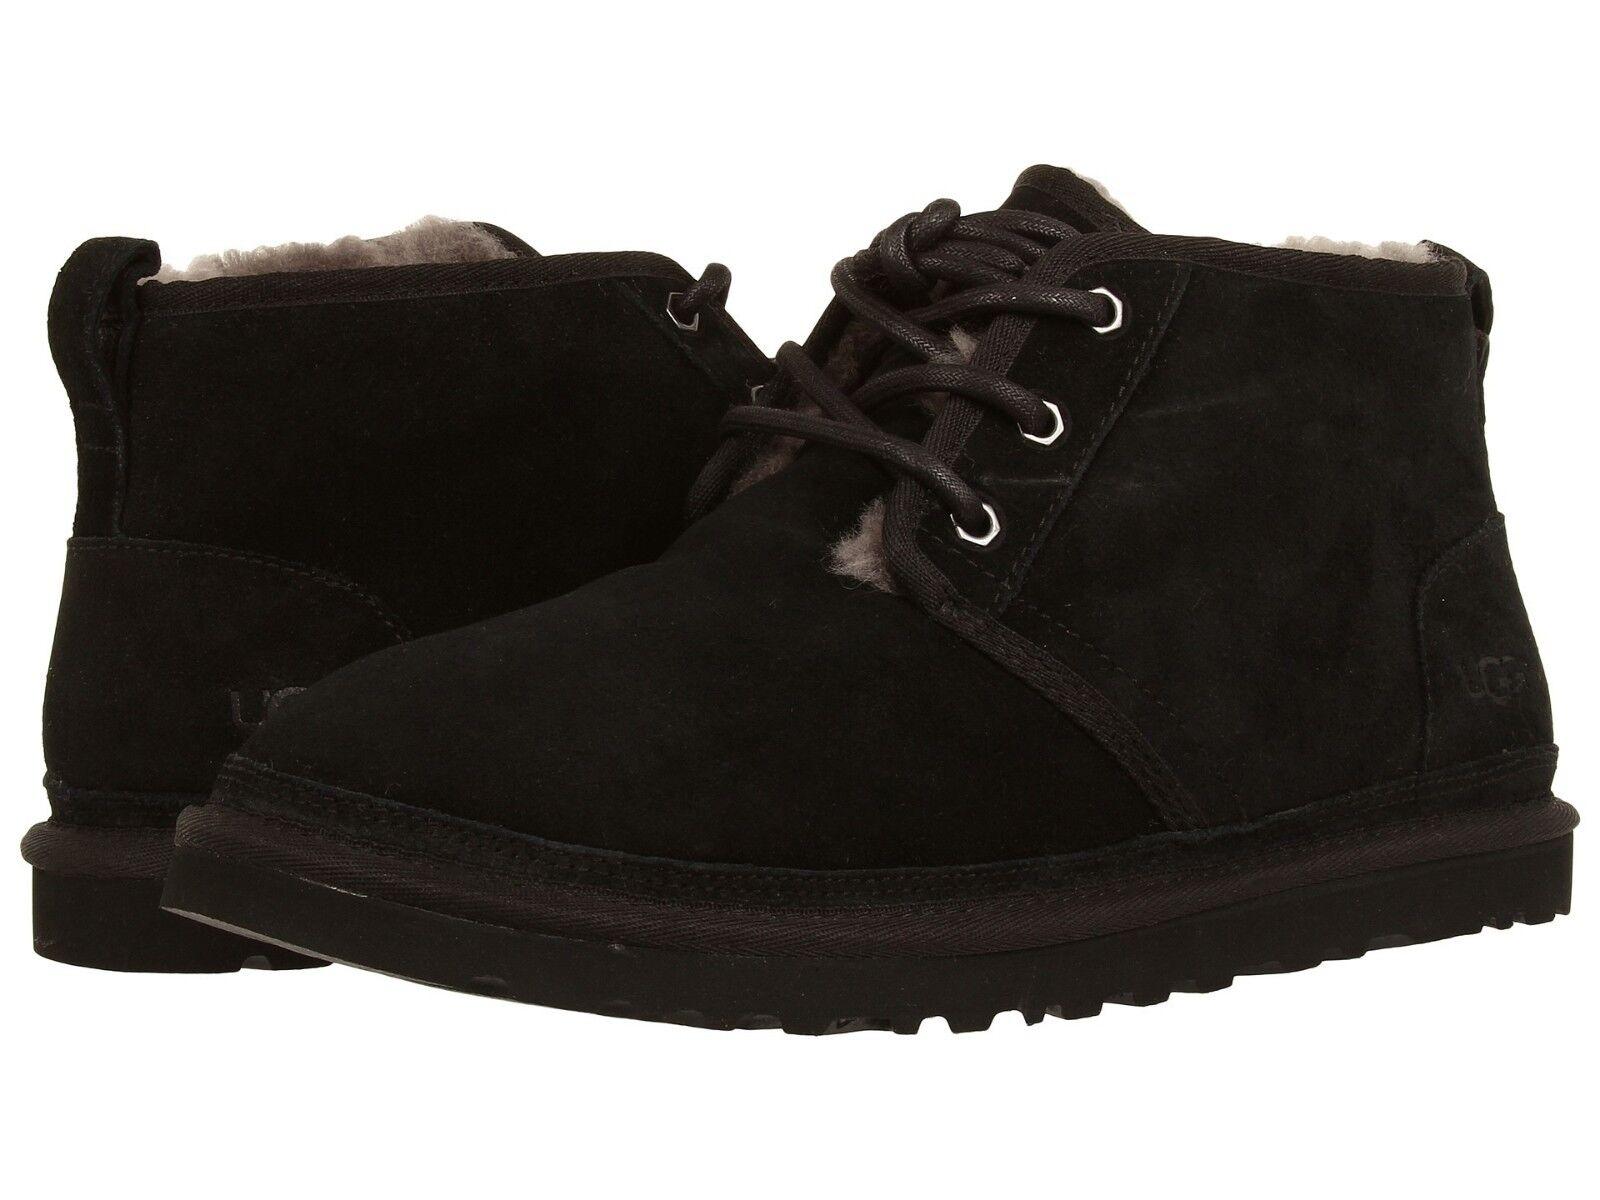 6a55224ce2b UGG Australia Mens Neumel Black Suede BOOTS 3236 Size US 12 UK 11